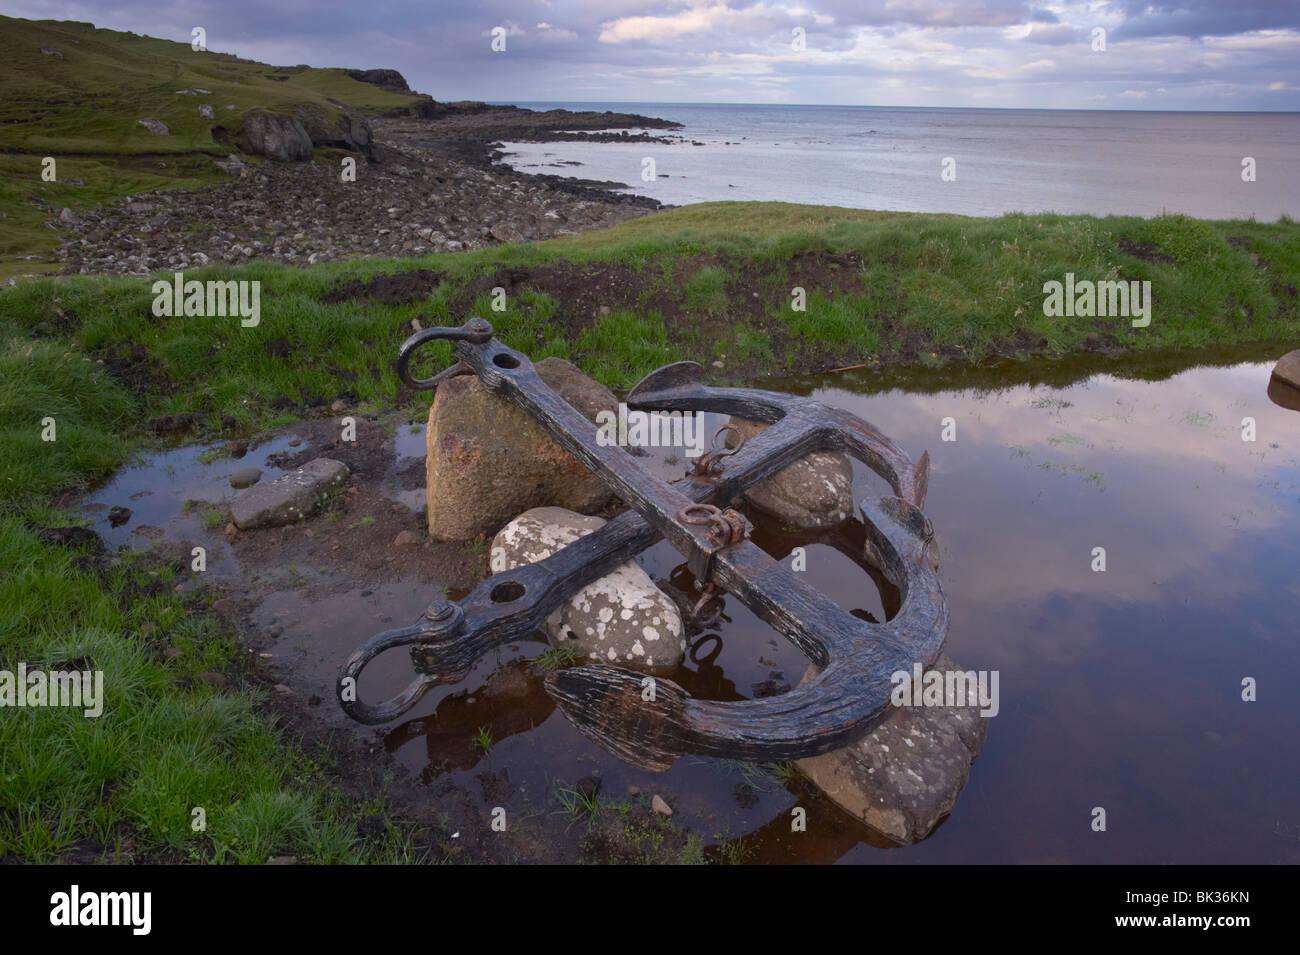 Shipwreck anchor in Soltuvik bay, west coast of Sandoy, Faroe Islands (Faroes), Denmark, Europe - Stock Image